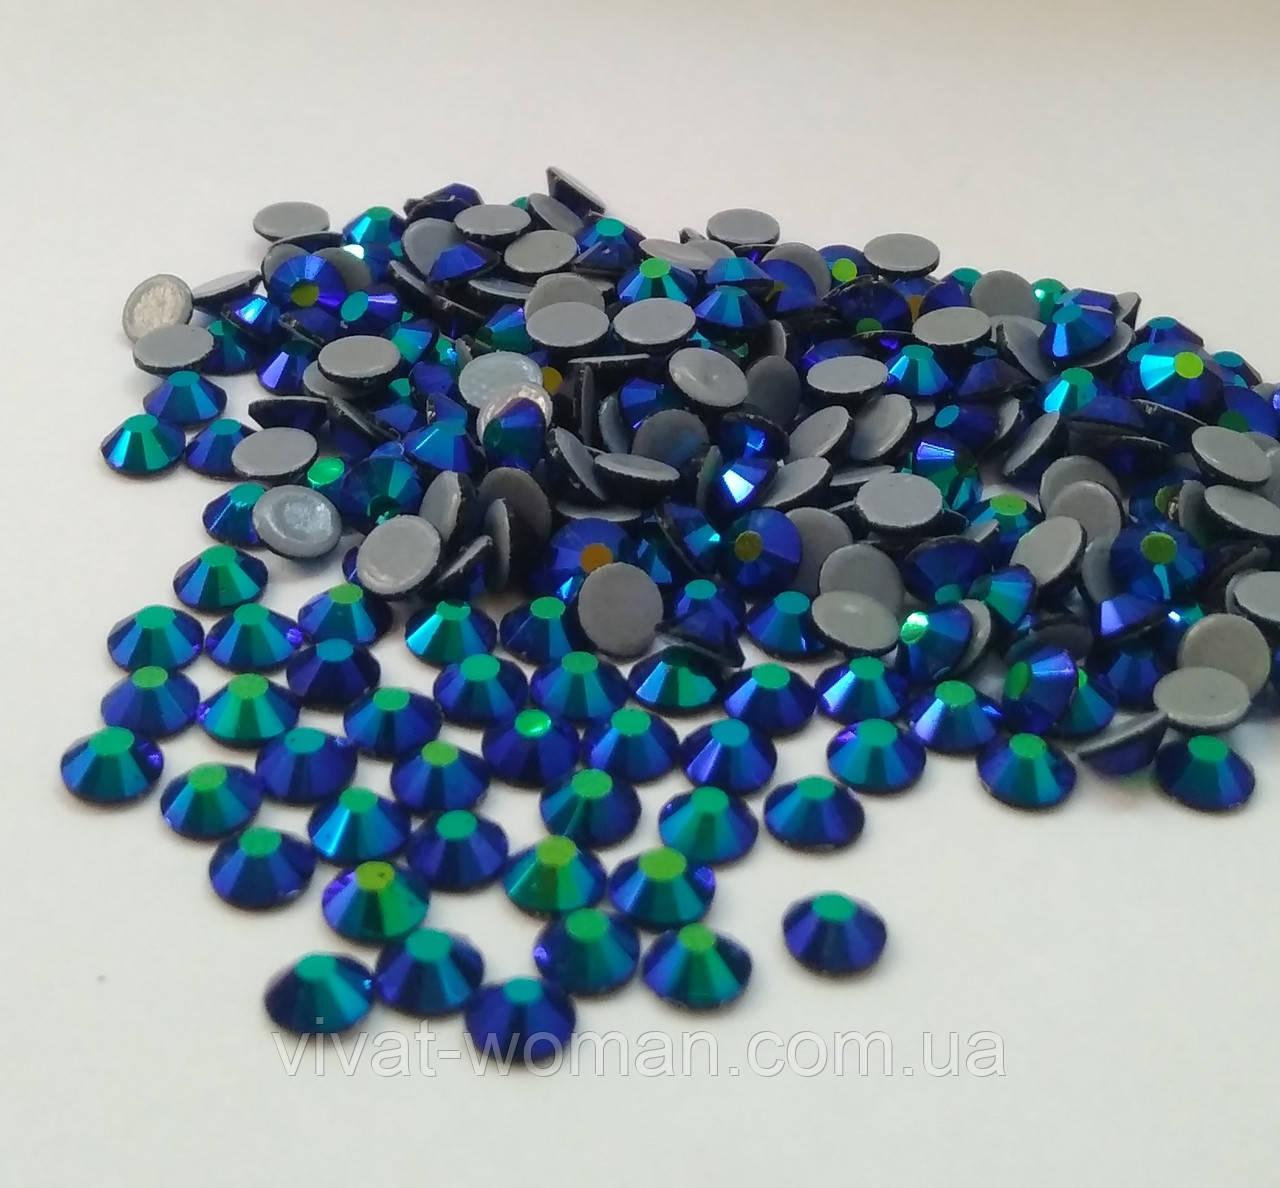 Стразы А+ Премиум, Montana AB (темно синий) SS20 (5,0 мм) термоклеевые. Цена за 144 шт.